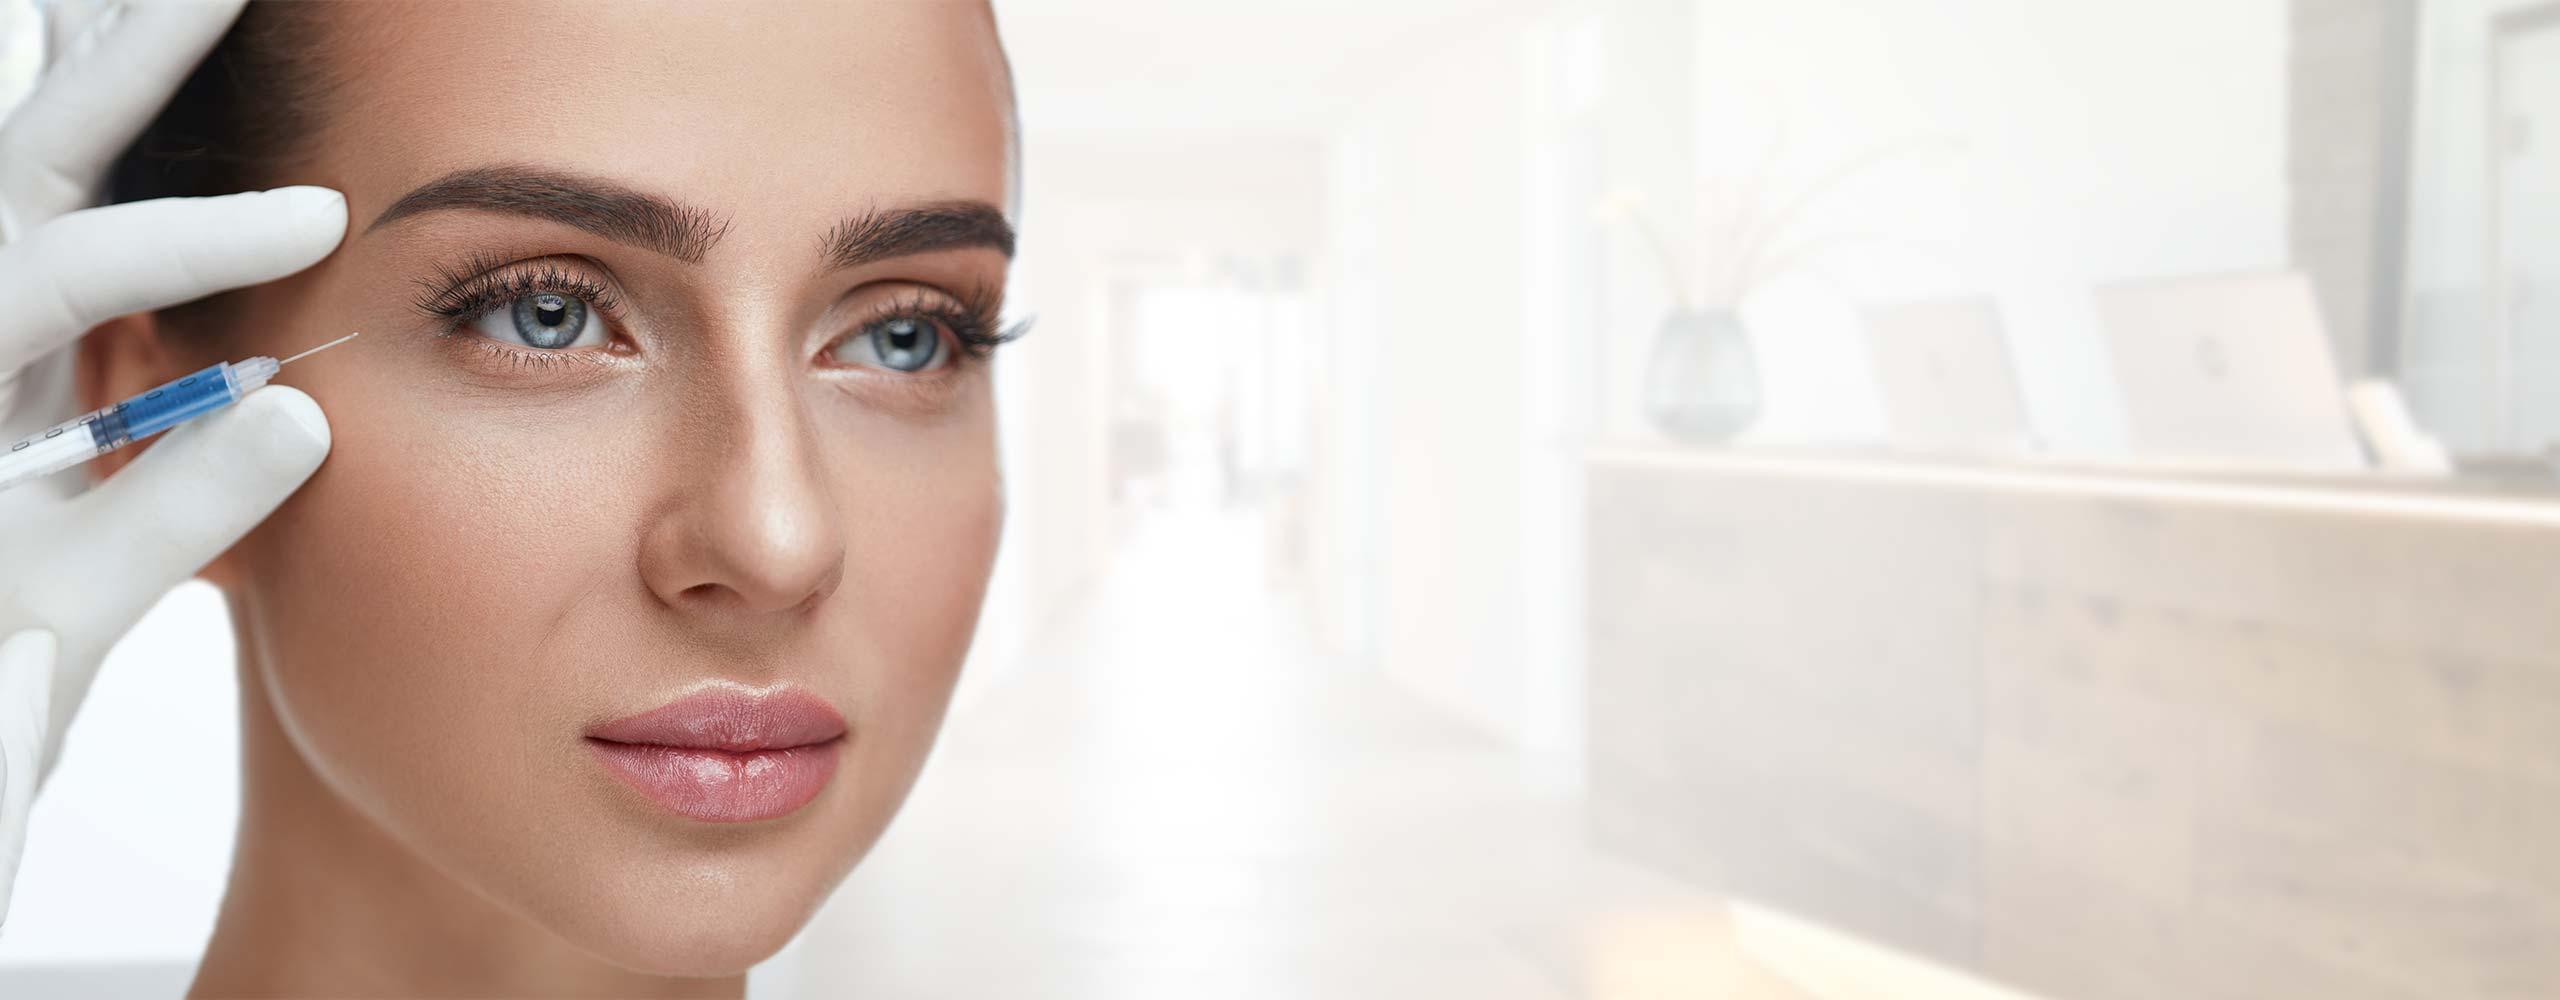 proaesthetic heidelberg schoenheitsklinik unterspritzungen augenlidstraffung